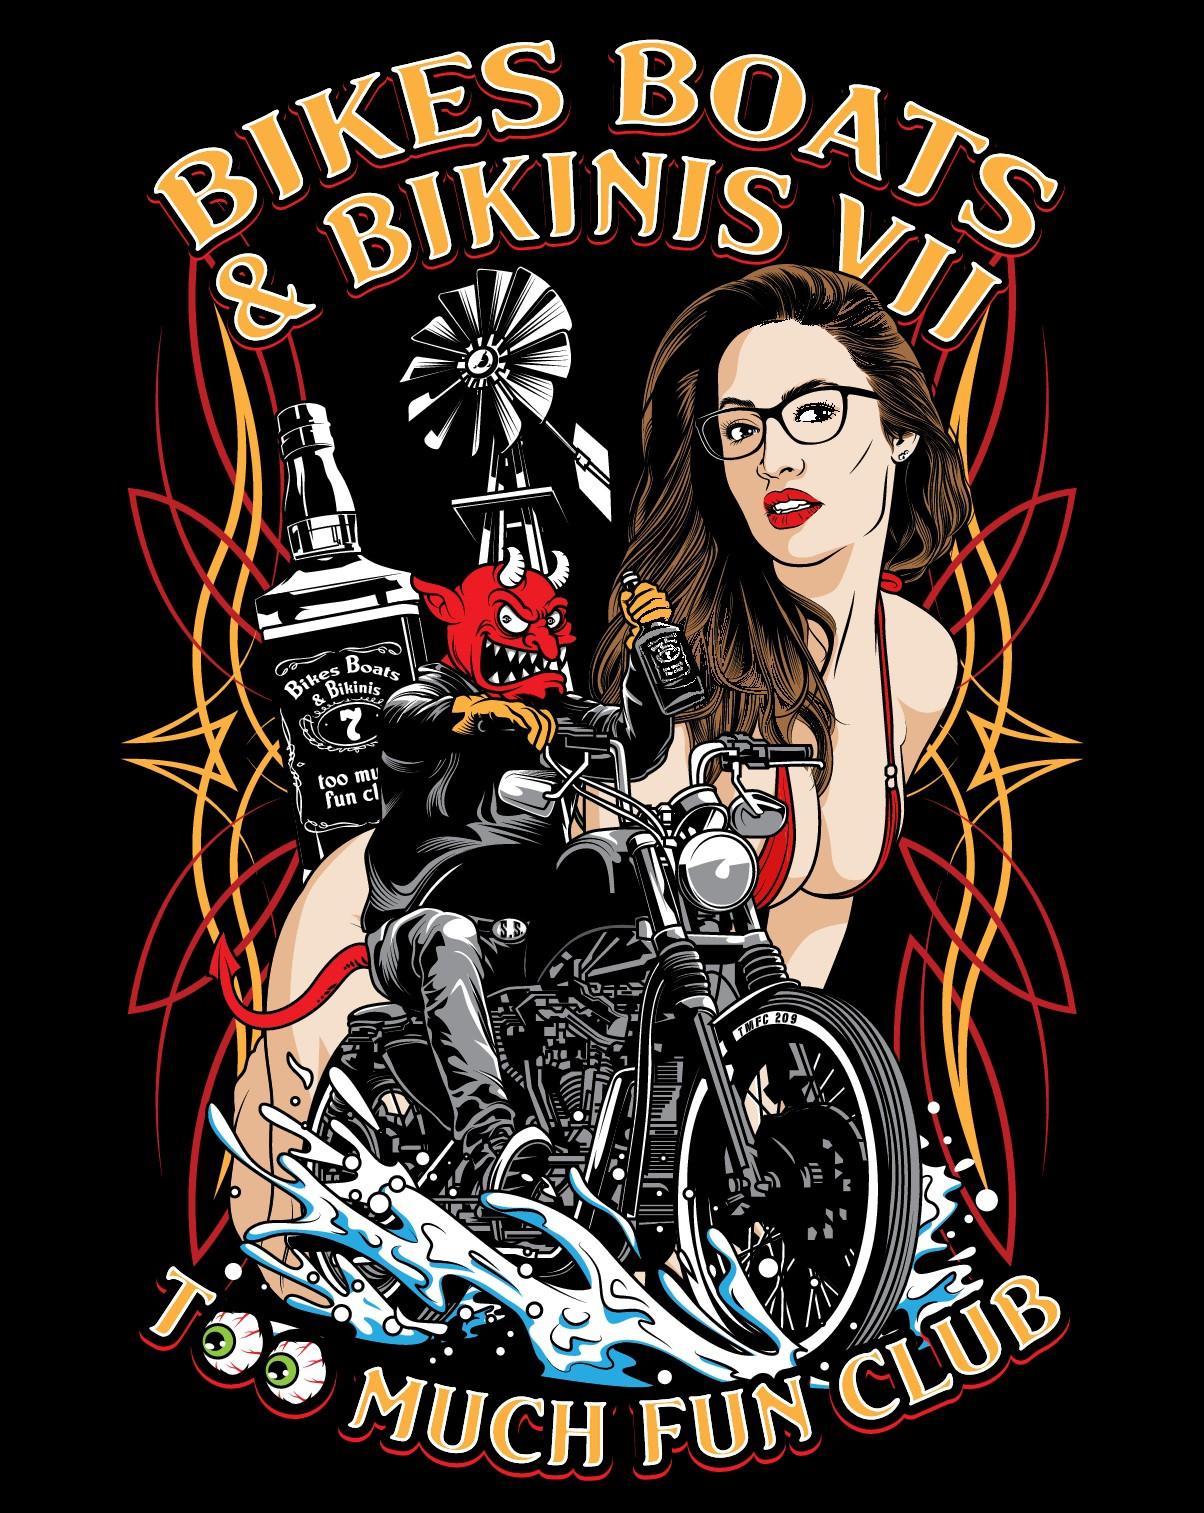 Bikes Boats Bikinis VII